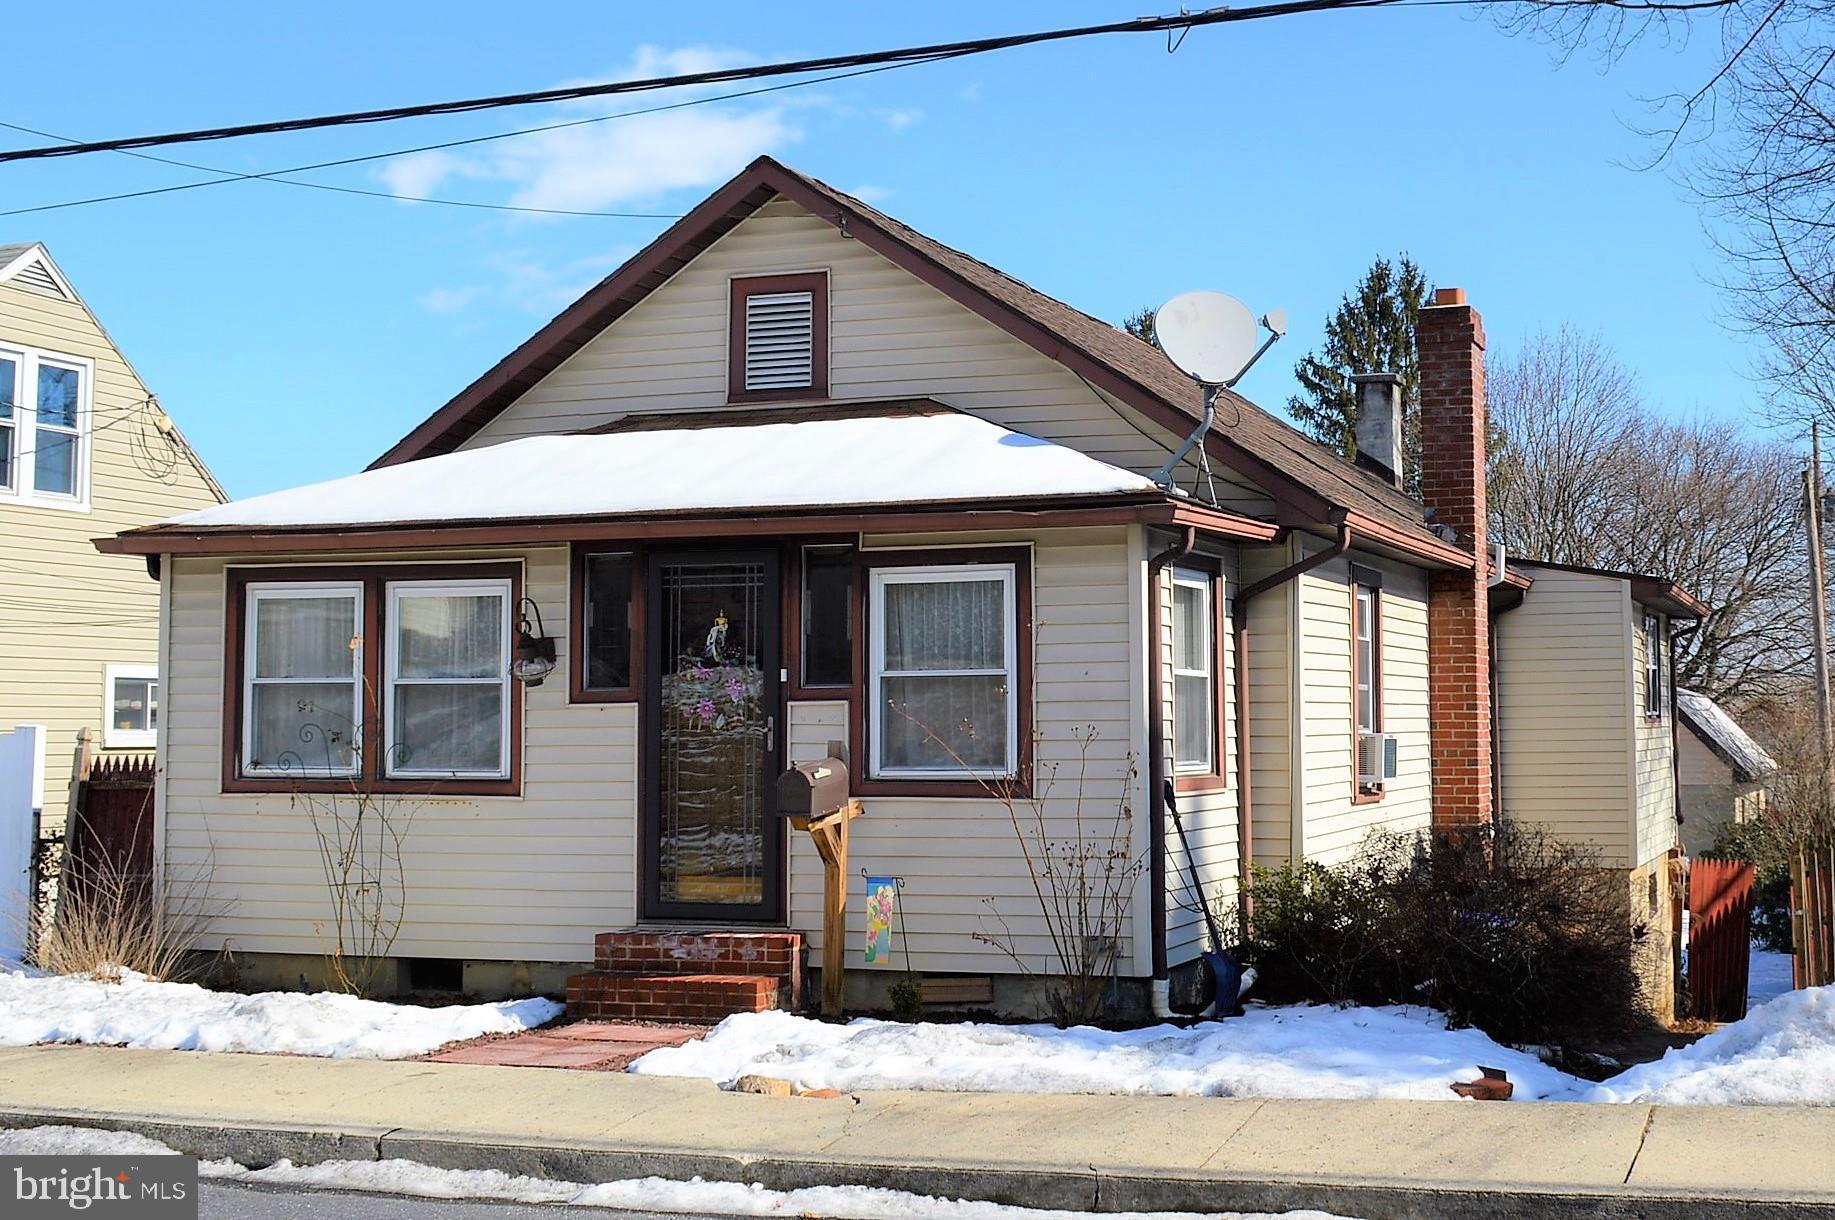 510 N WALNUT STREET, MOUNT HOLLY SPRINGS, PA 17065